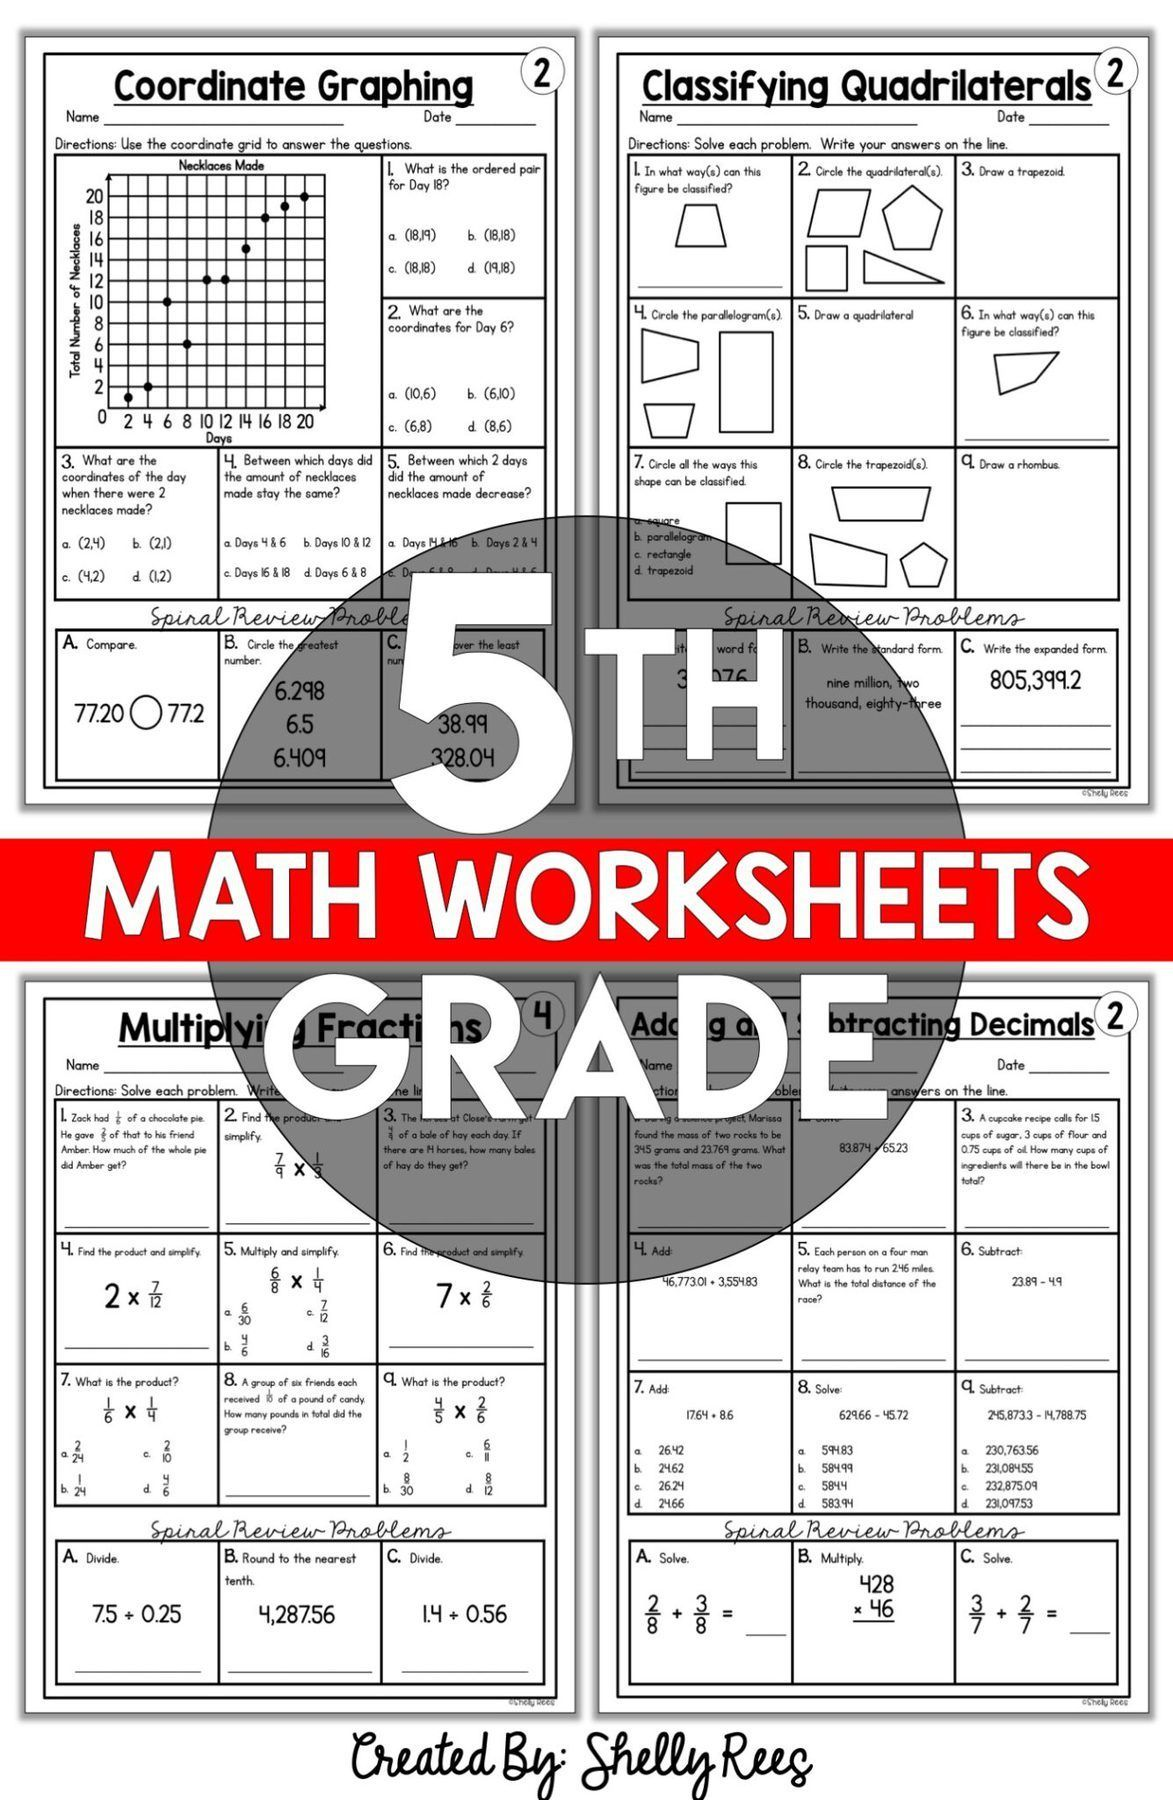 5th Grade Math Worksheets Free And Printable